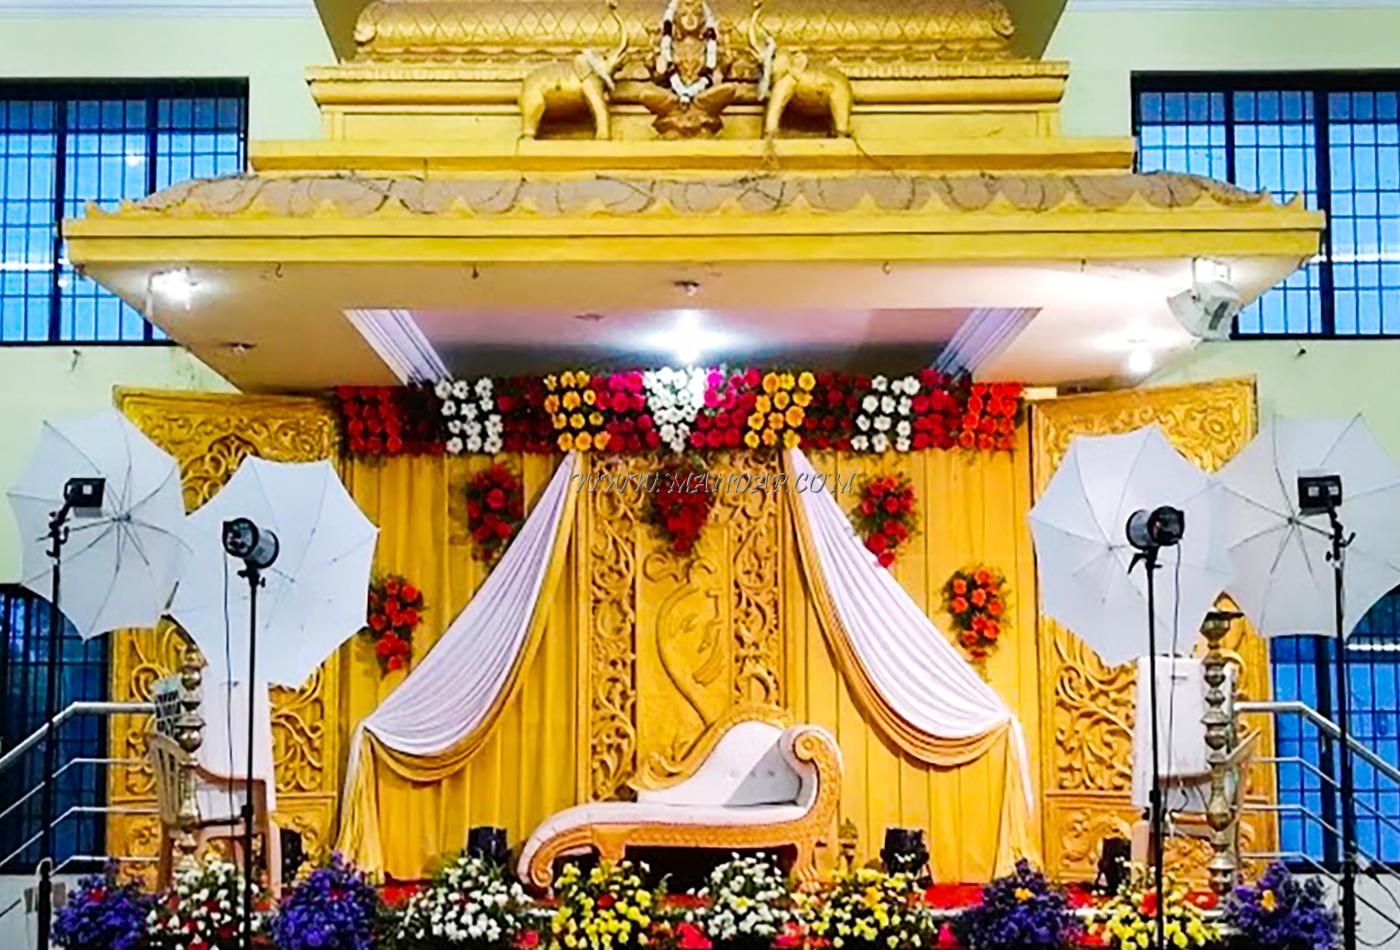 Find the availability of the Bala Kannaiya Padaiyatchi Thirumana Mahal in Cuddalore, Pondicherry and avail special offers